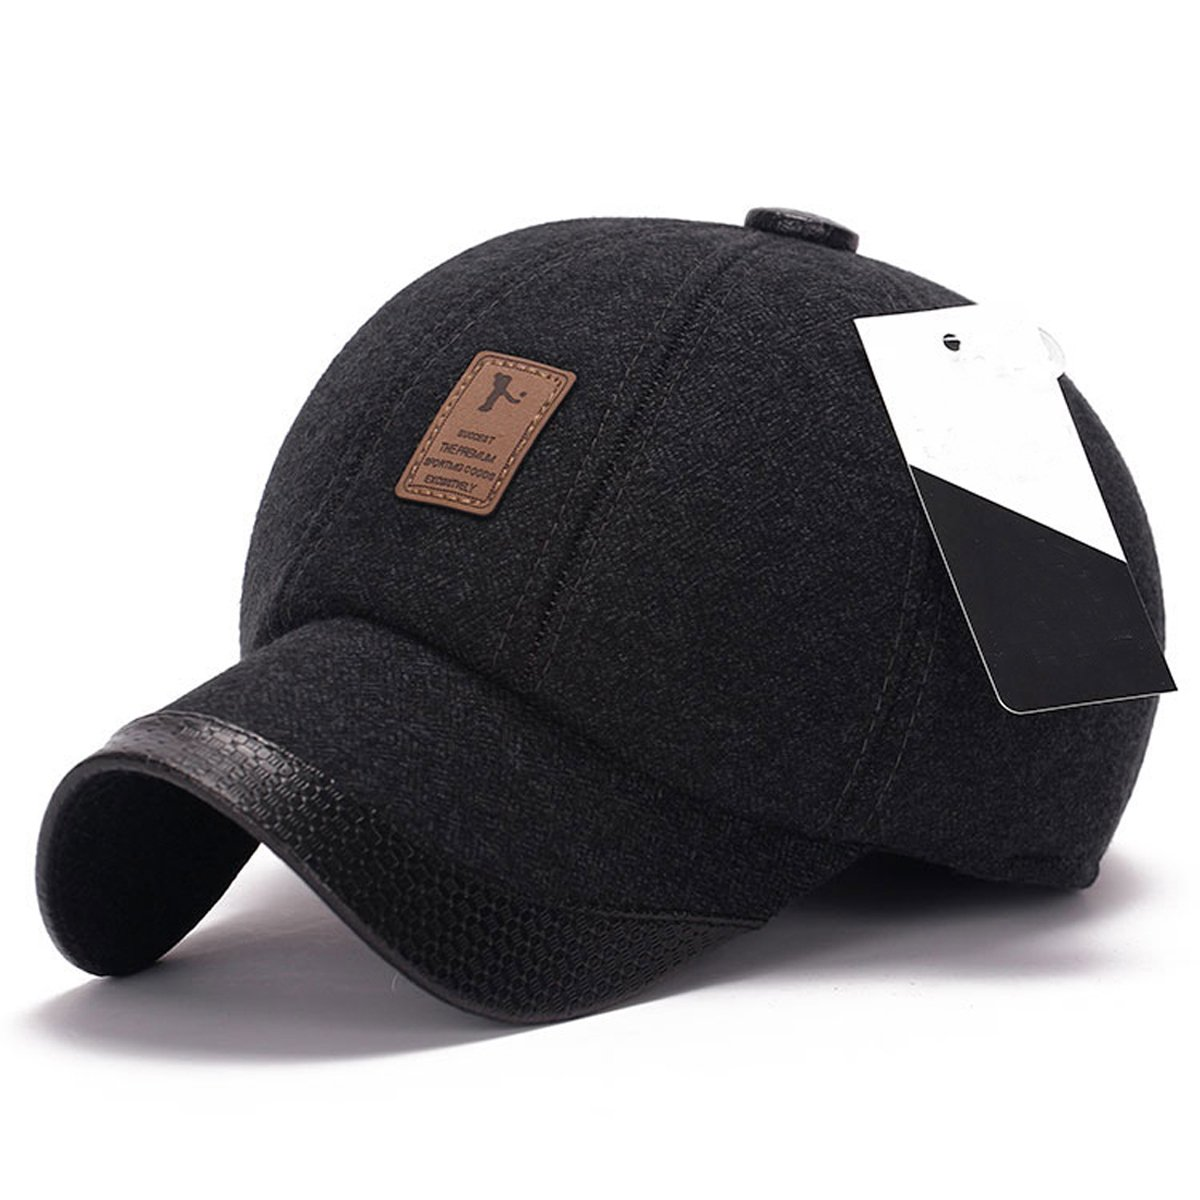 King Star Men Flexfit Wool Warm Winter Solid Plain Baseball Cap Hat Black  at Amazon Men s Clothing store  30407c6f67c